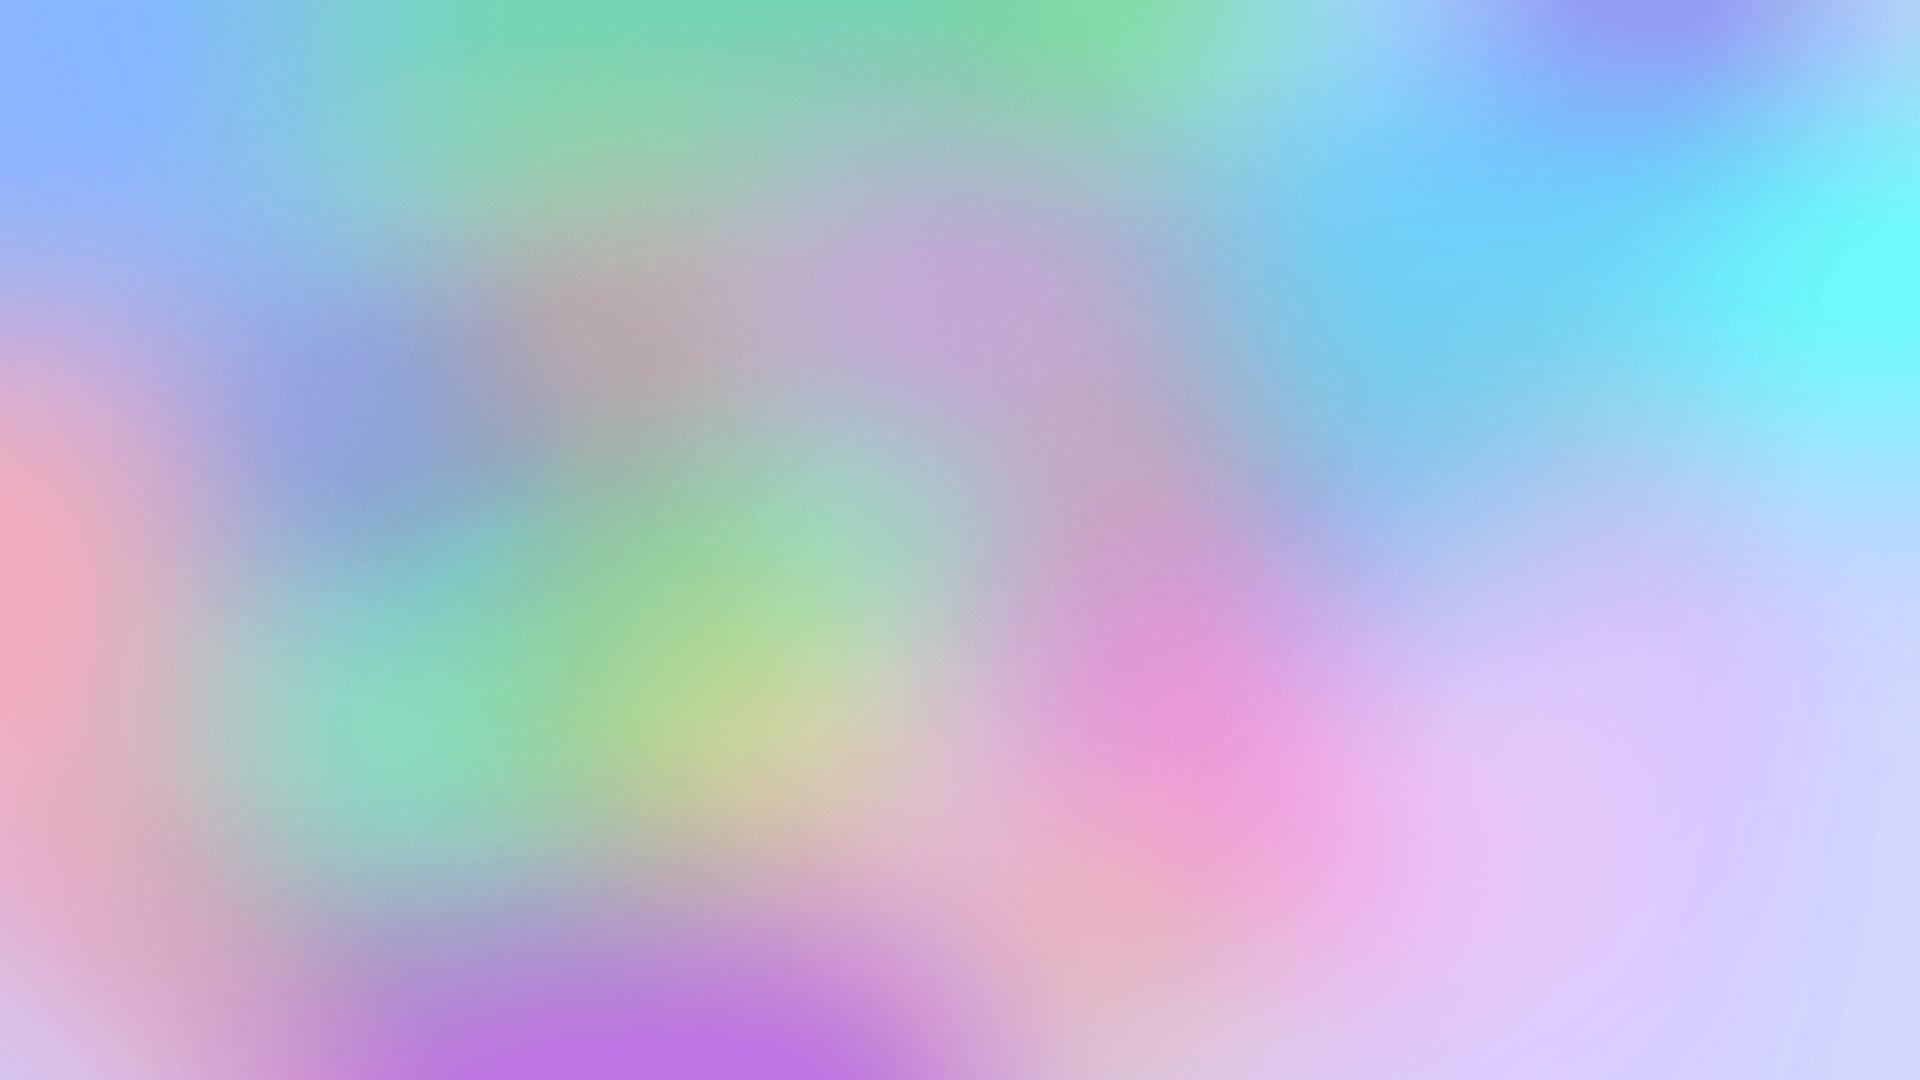 Pure Pastel Colors Wallpaper - Soft Colors Background - HD Wallpaper